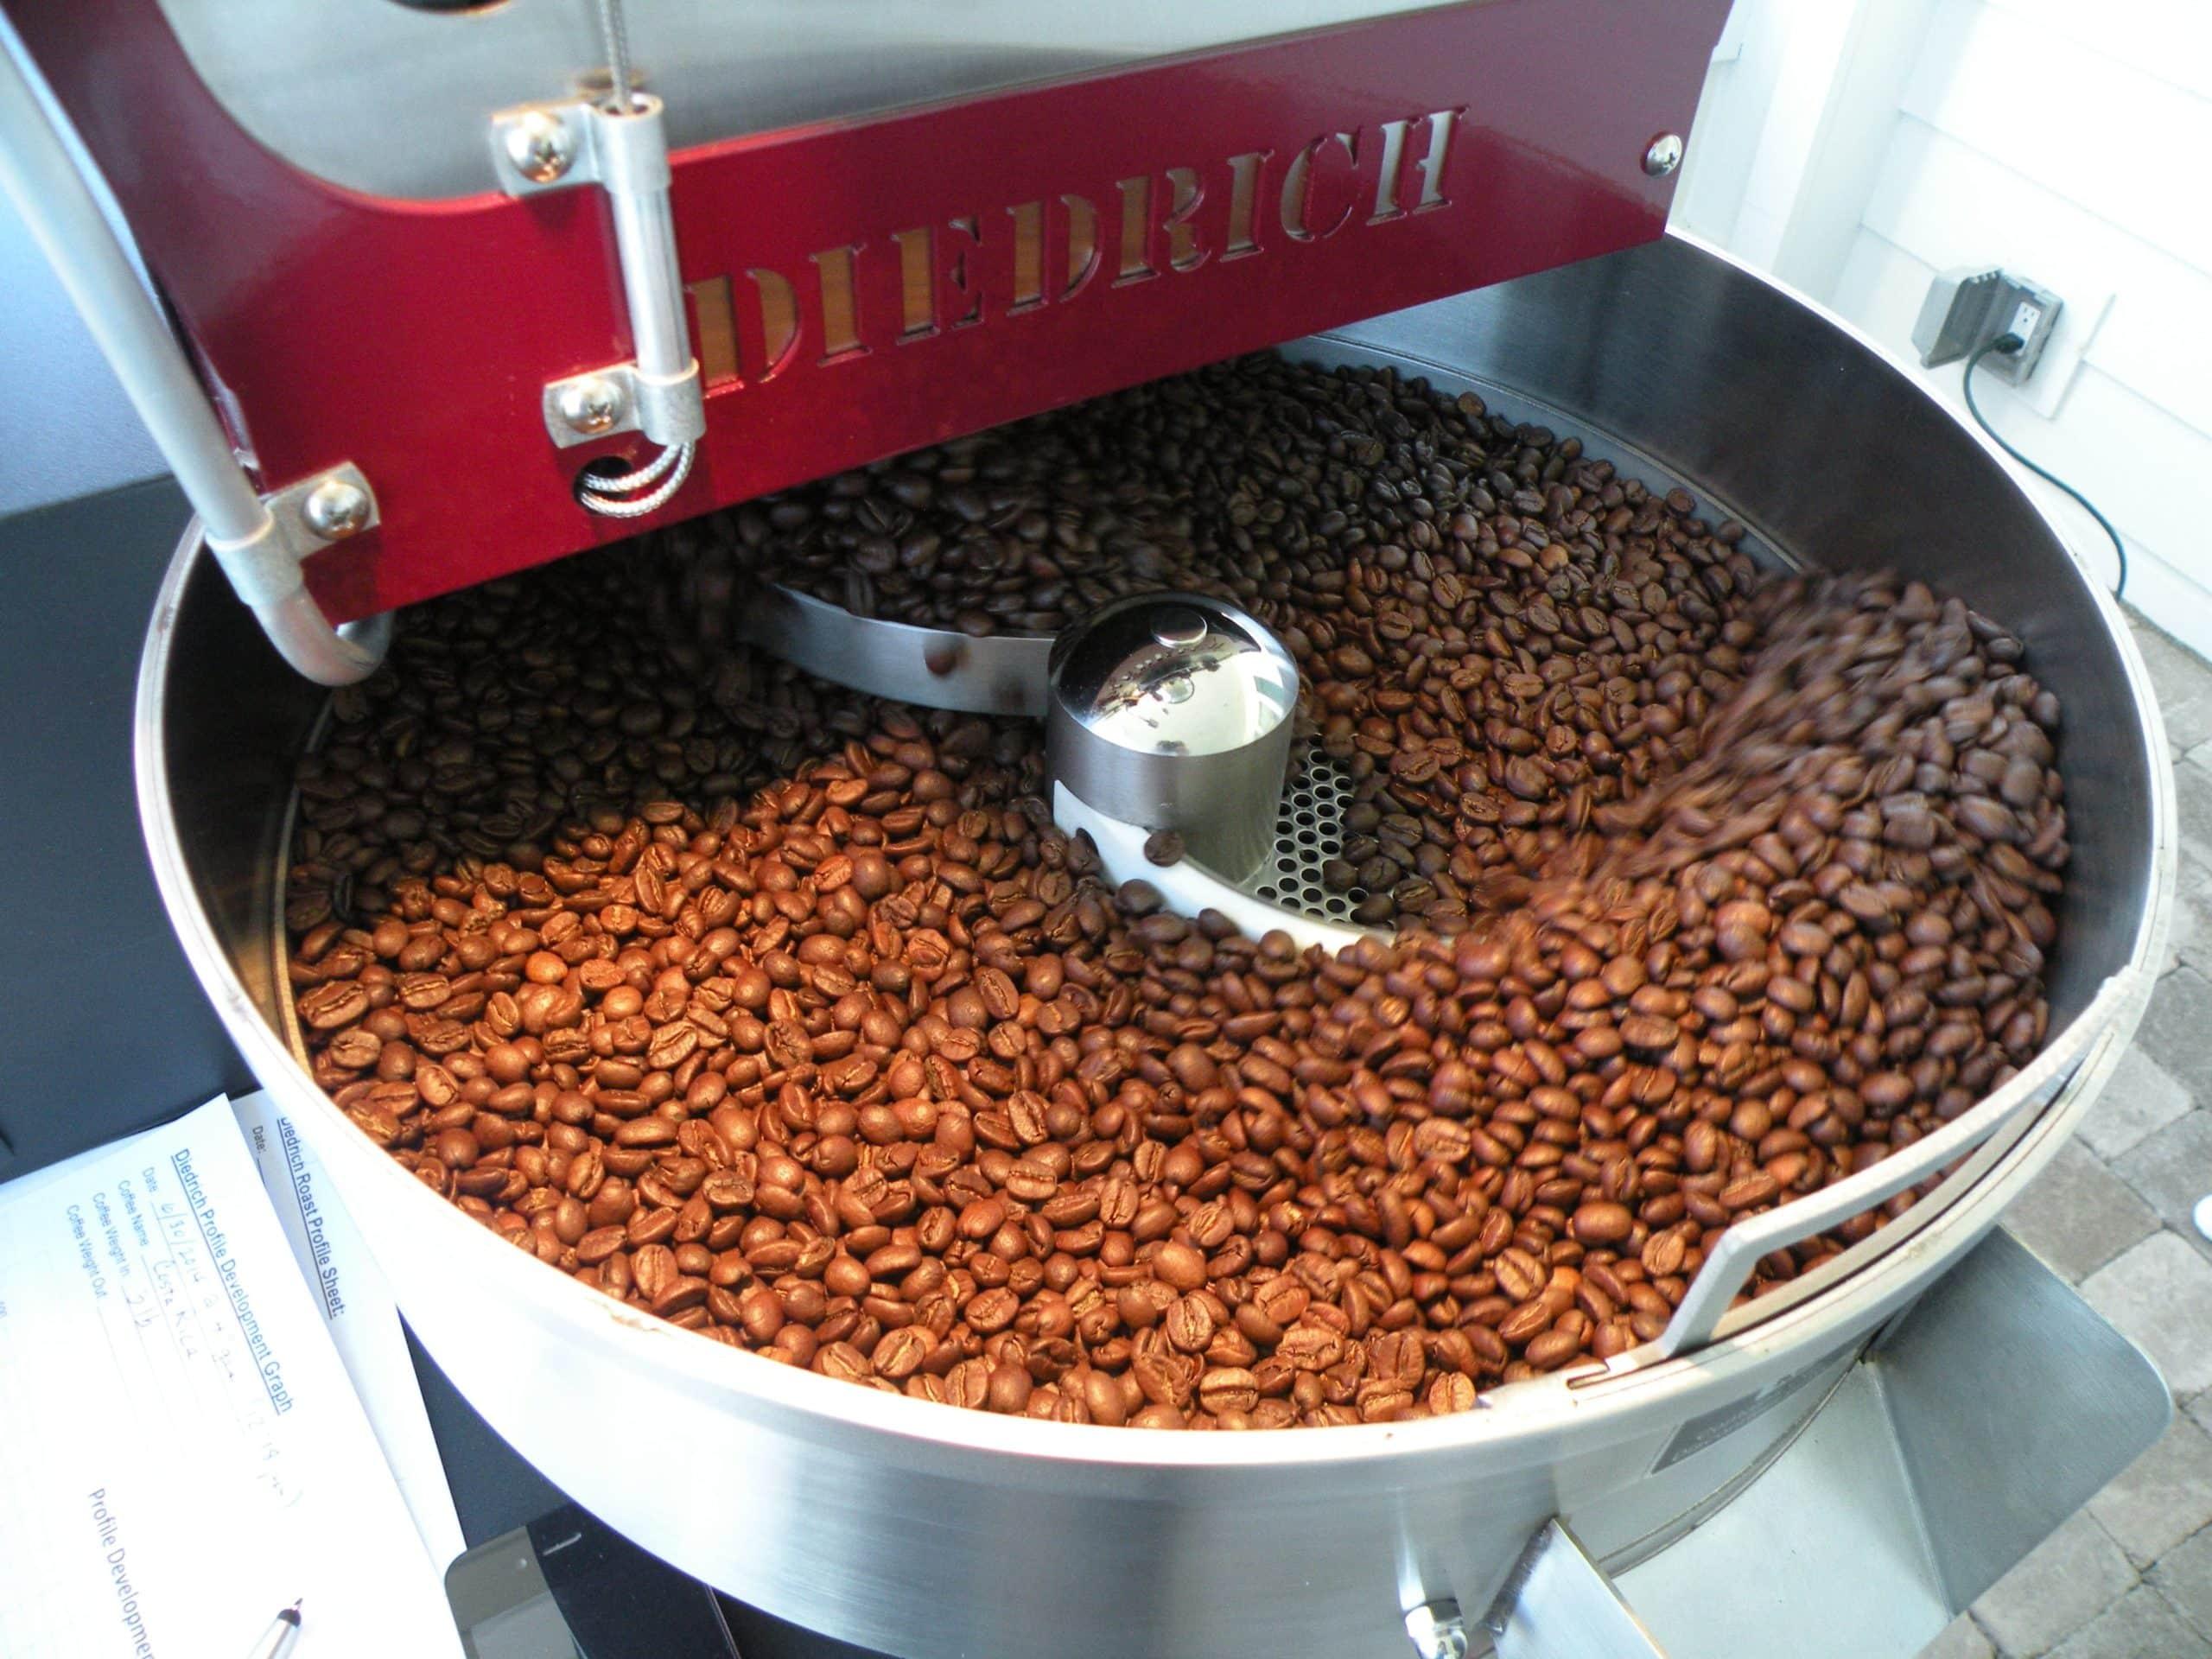 Diedrich coffee roaster at George Washington Inn